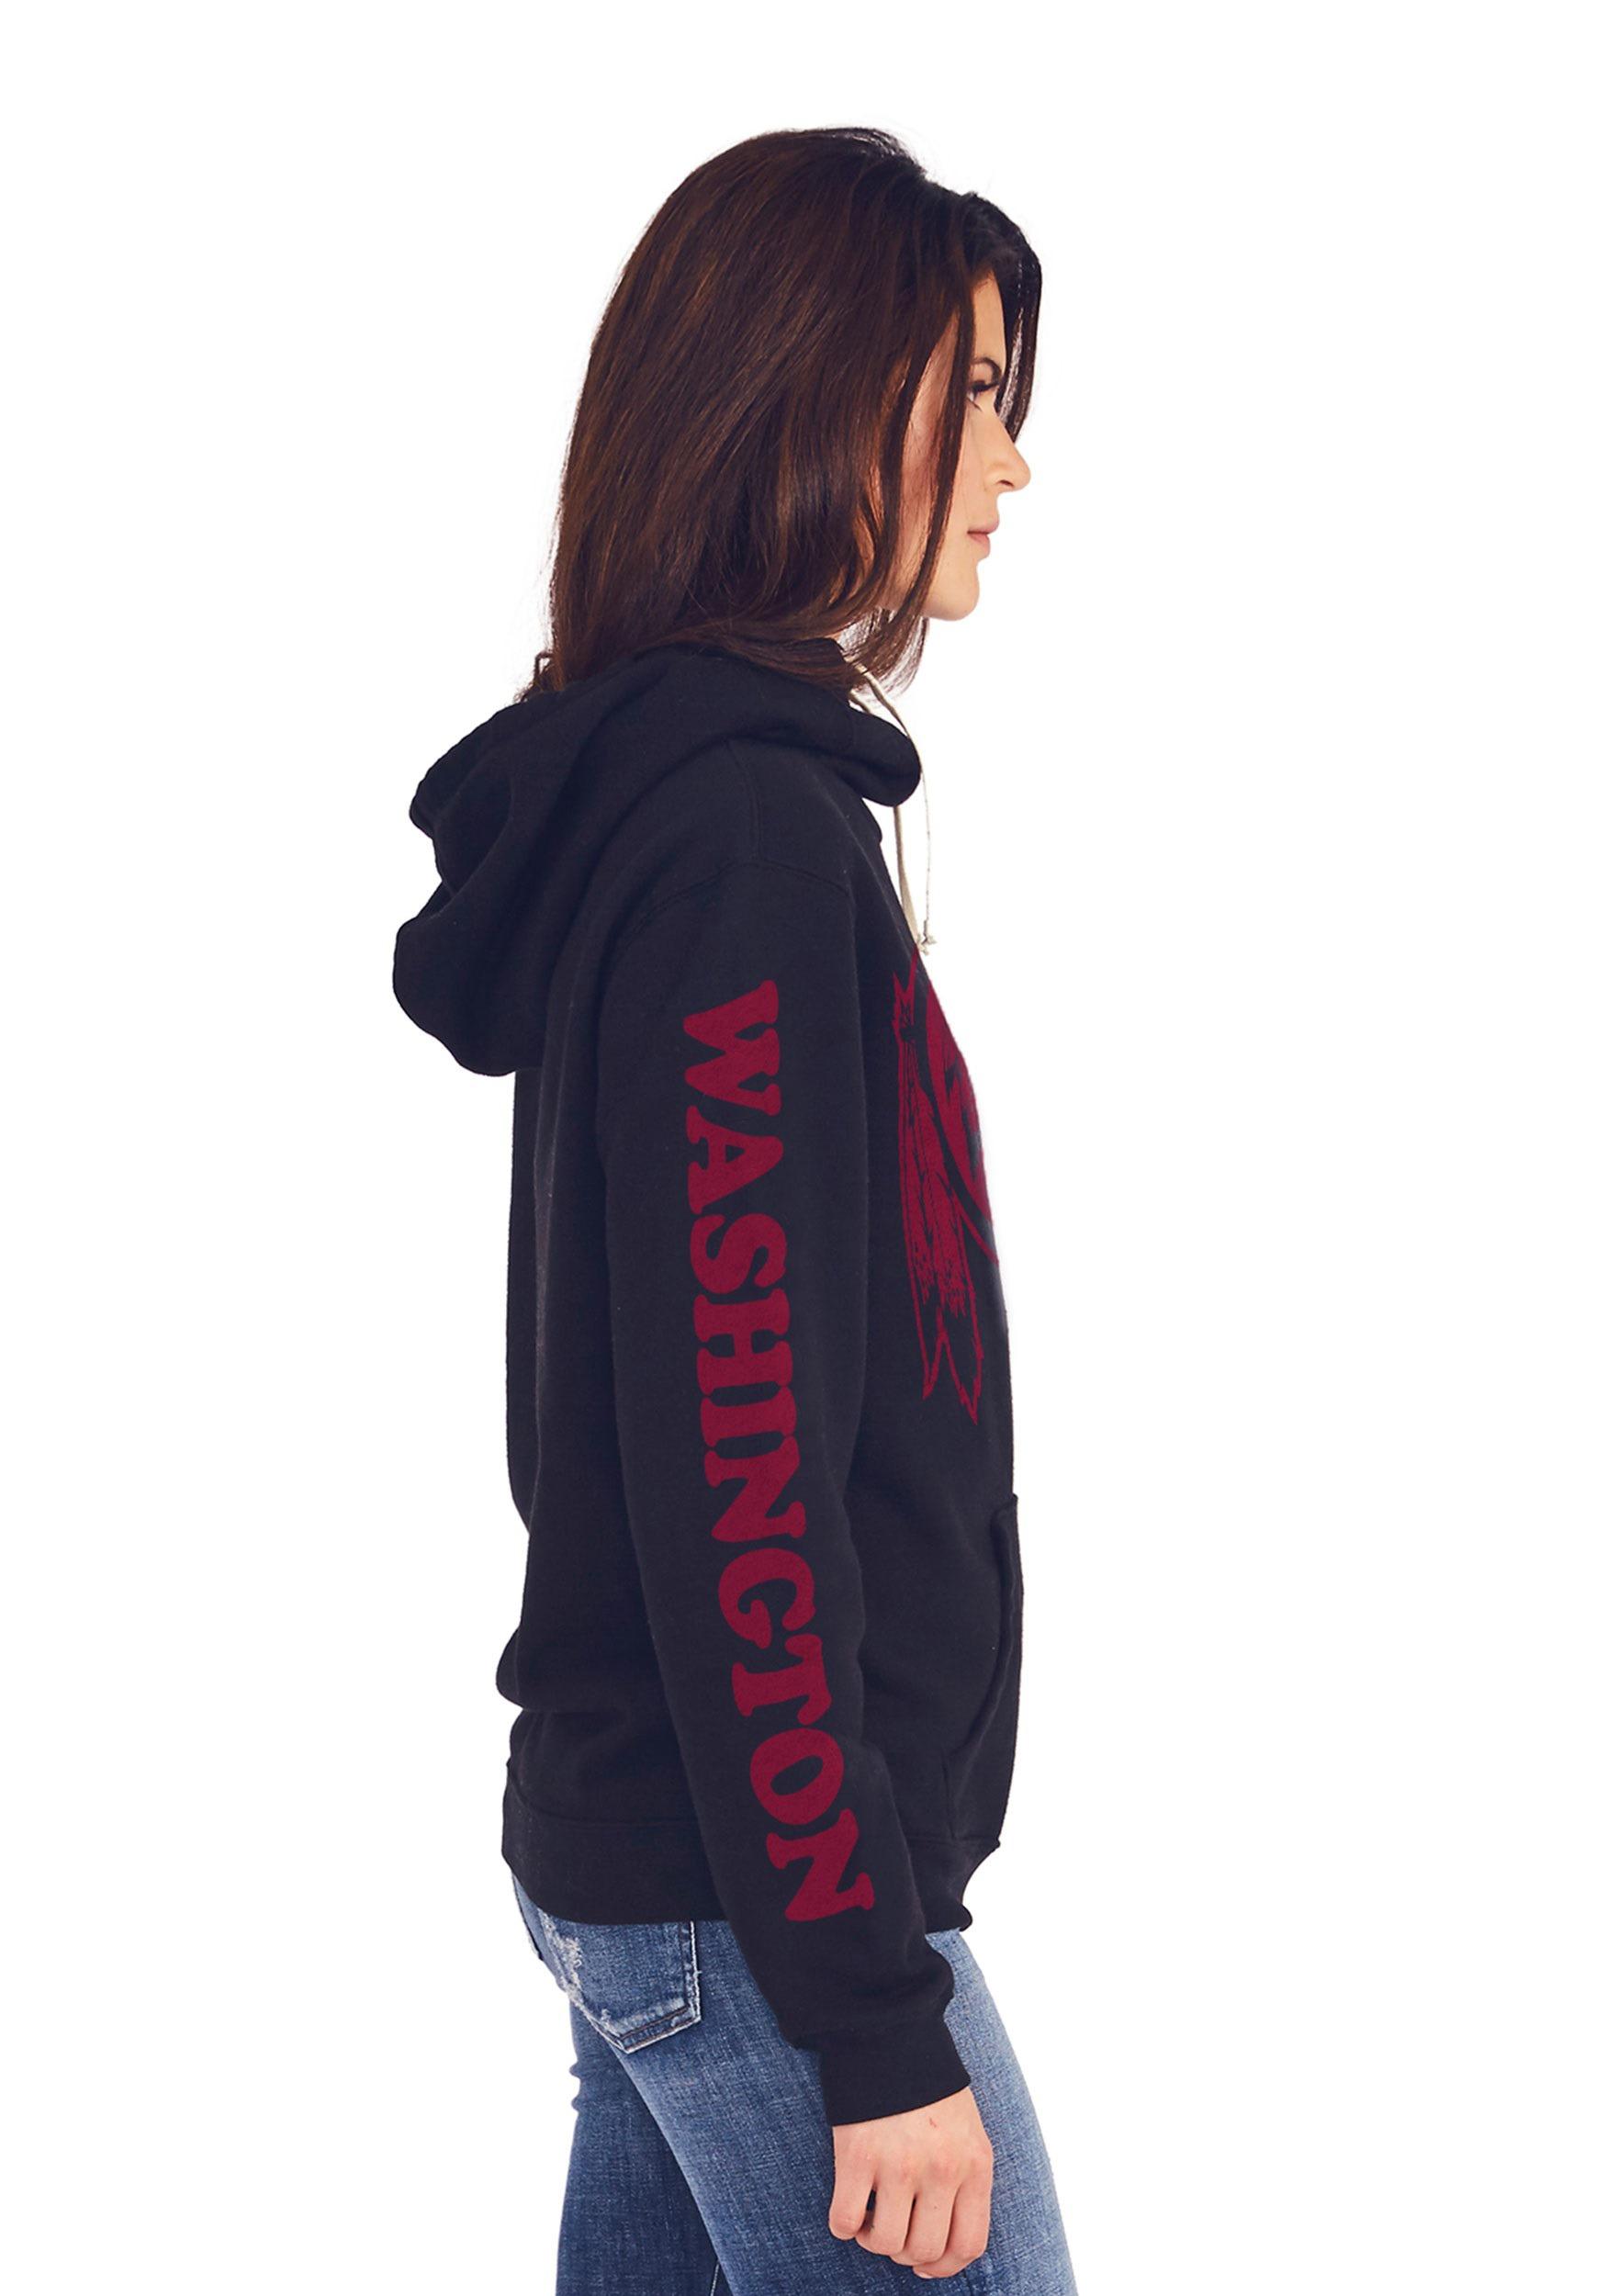 outlet store 72eca e68ce Washington Redskins Women's Cowl Neck Hooded Sweatshirt